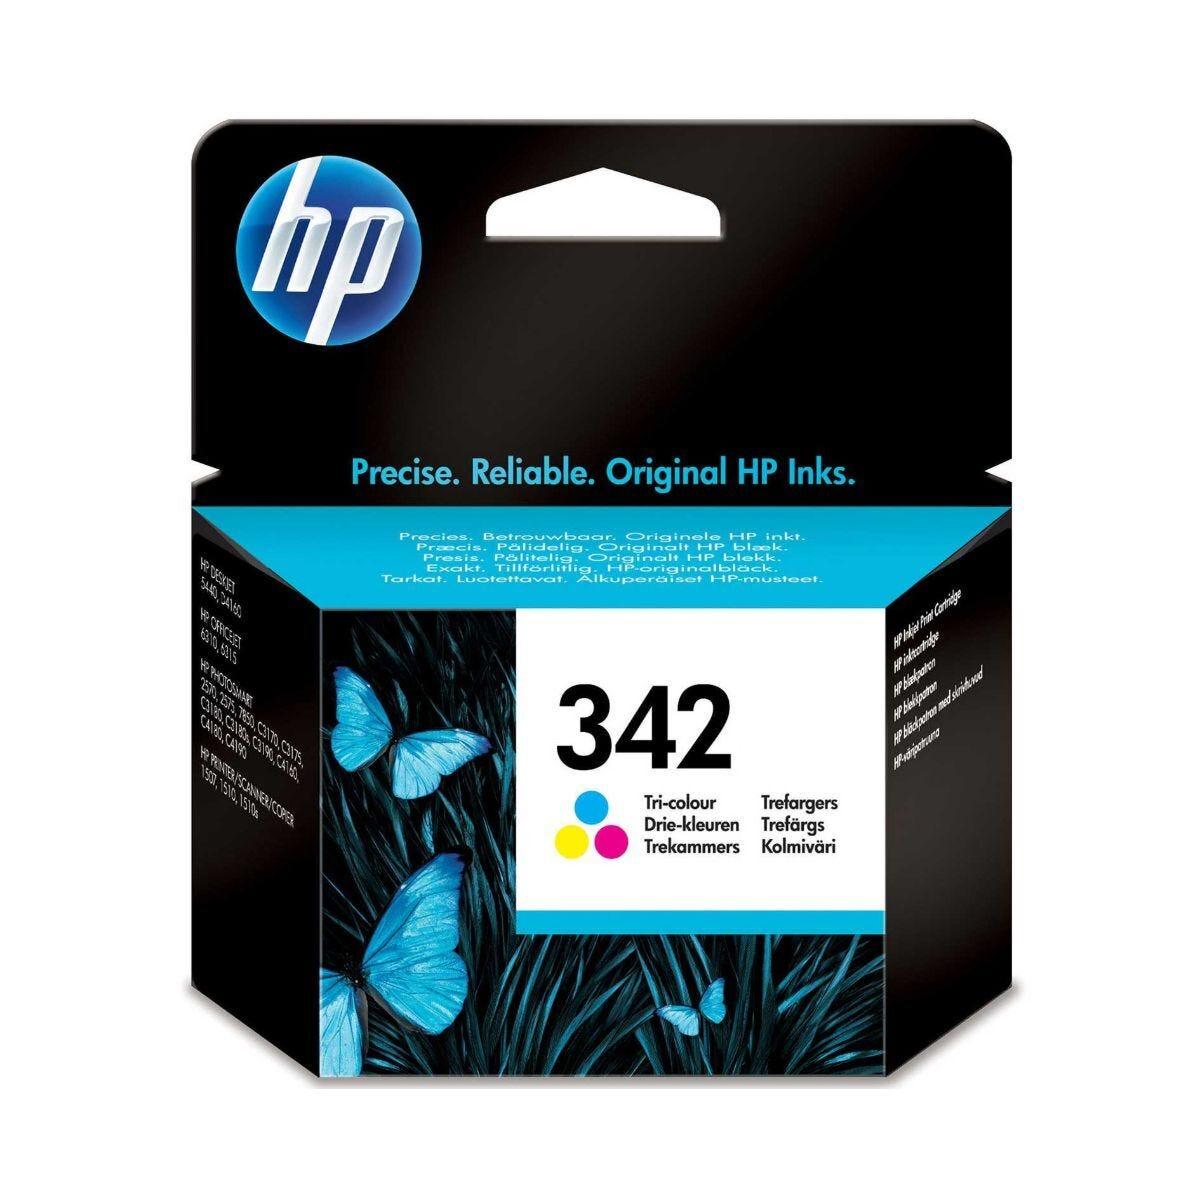 HP 342 Ink Cartridge 5ml